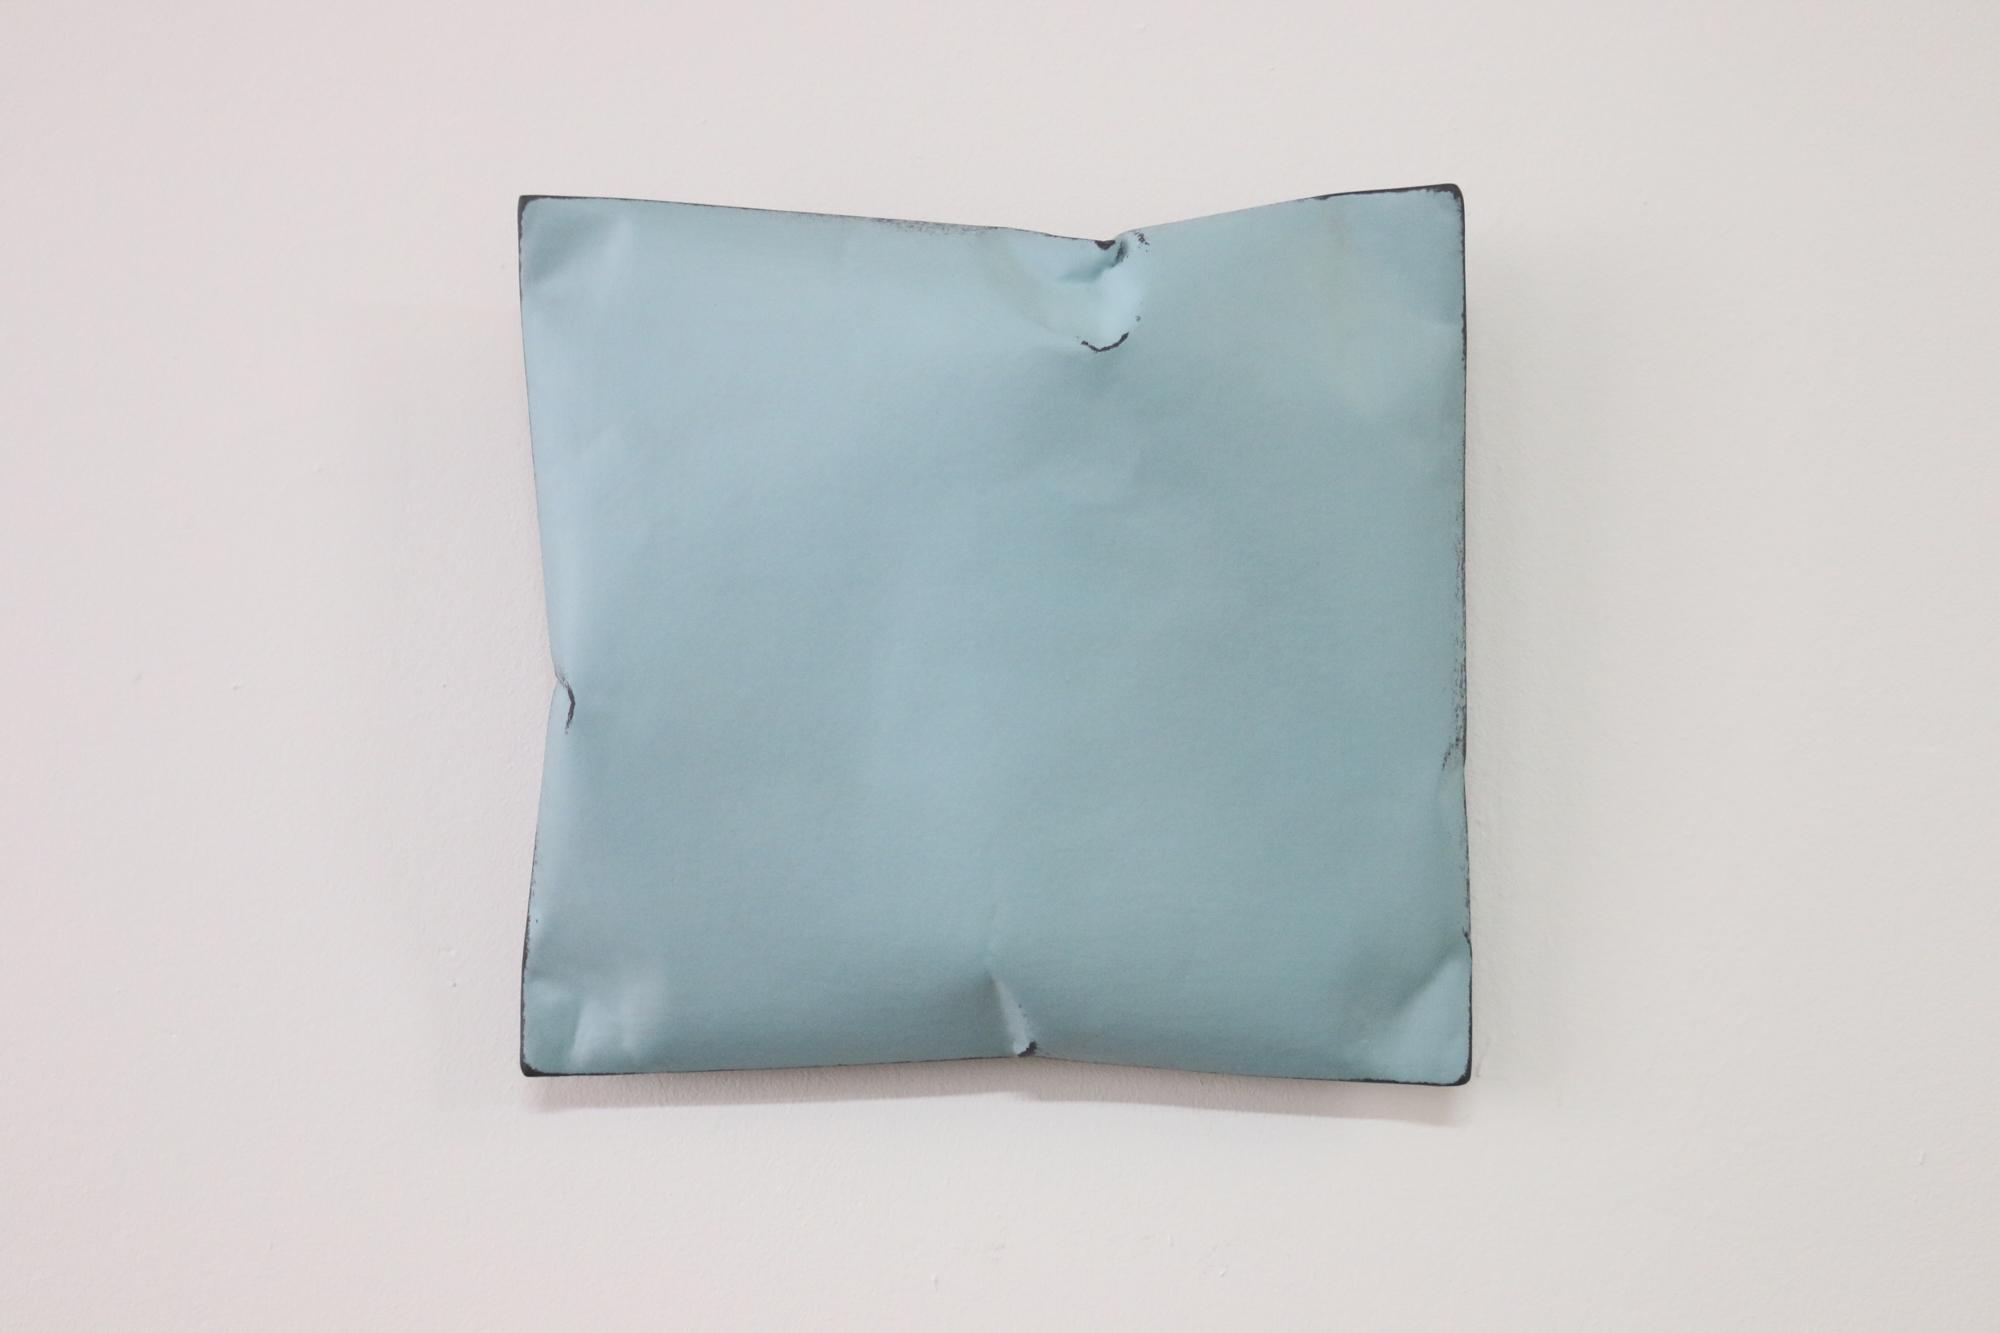 Johan De Wit, Untitled, 2018, Paper, Resin, Marble, Acrylic, 22.5 x 21 x 6 cm, Affinity Art